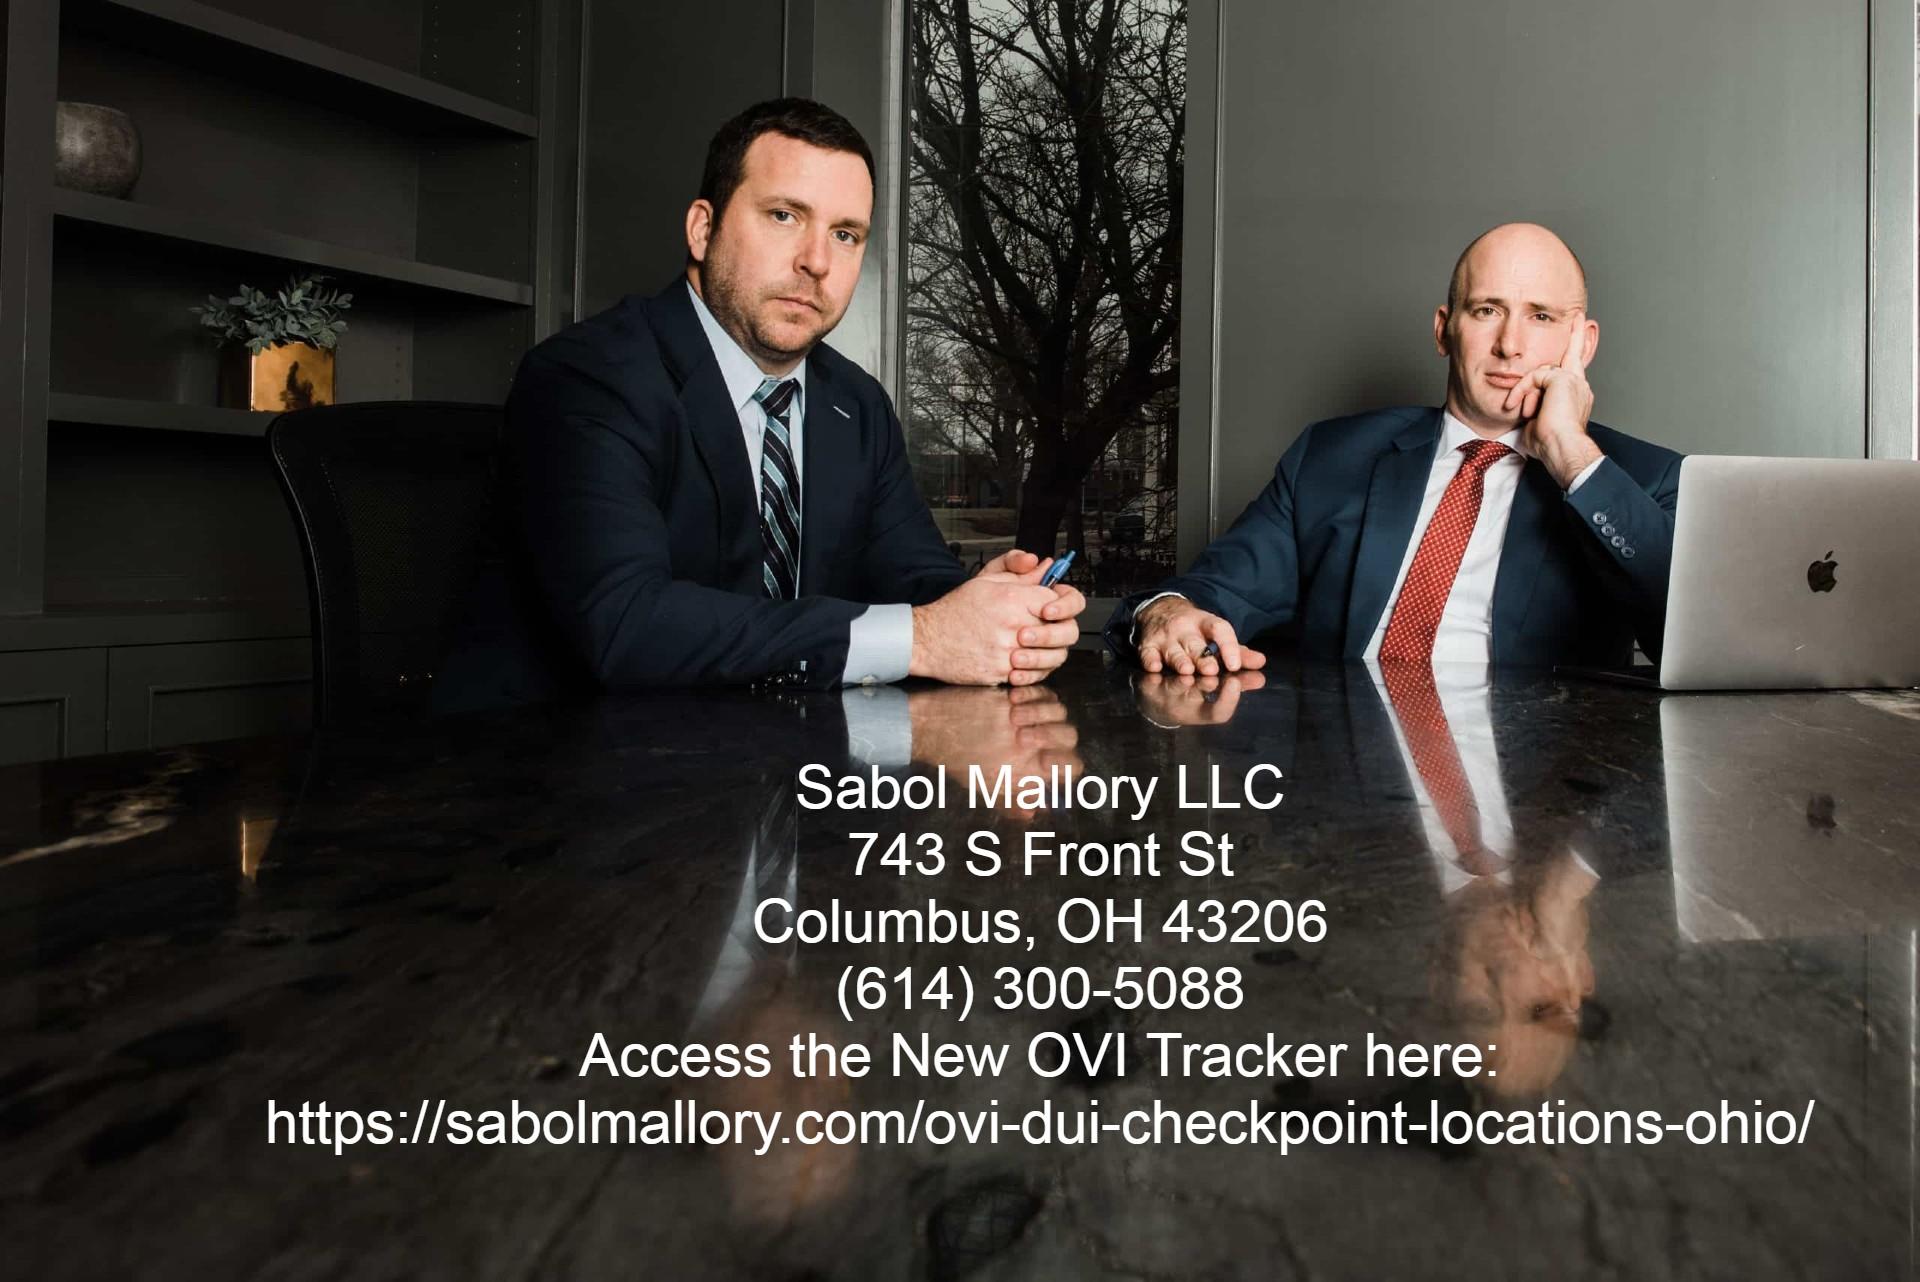 Columbus DUI Lawyers Sabol Mallory LLC Launch OVI Checkpoint Location Tracker